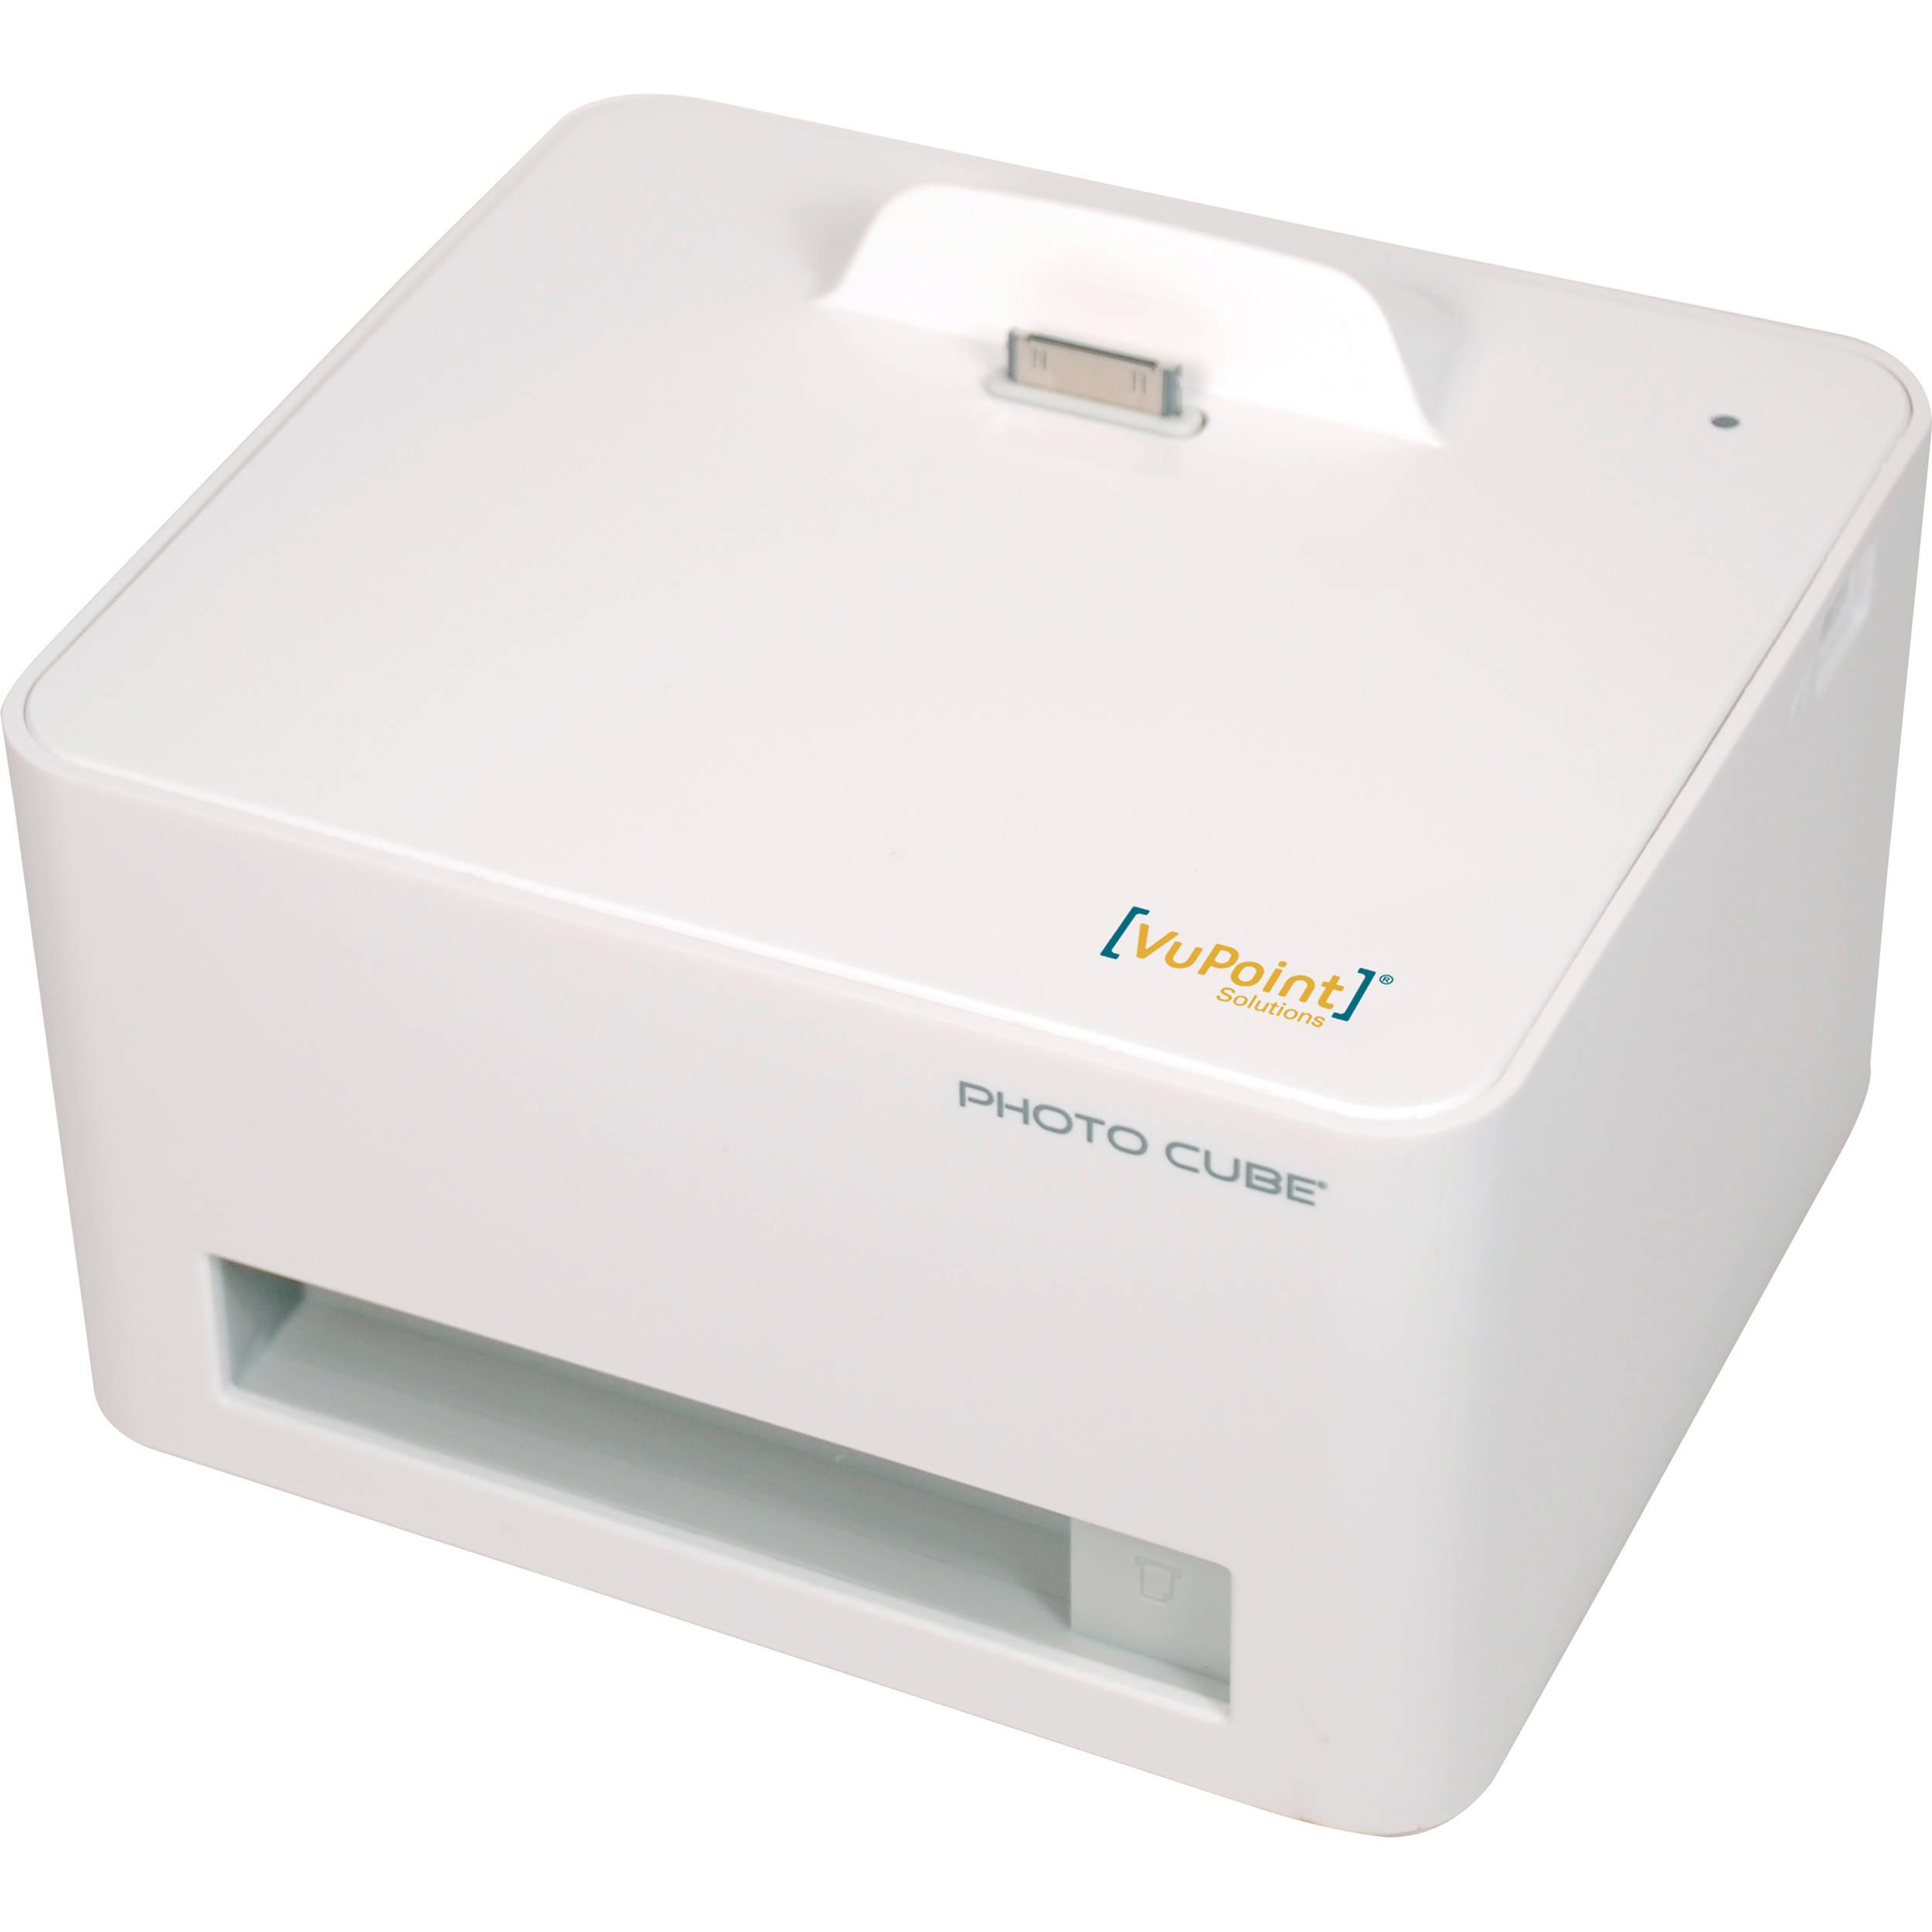 Vupoint Solutions Photo Cube Compact Dye Sub Photo Ip P20 Vp Bh